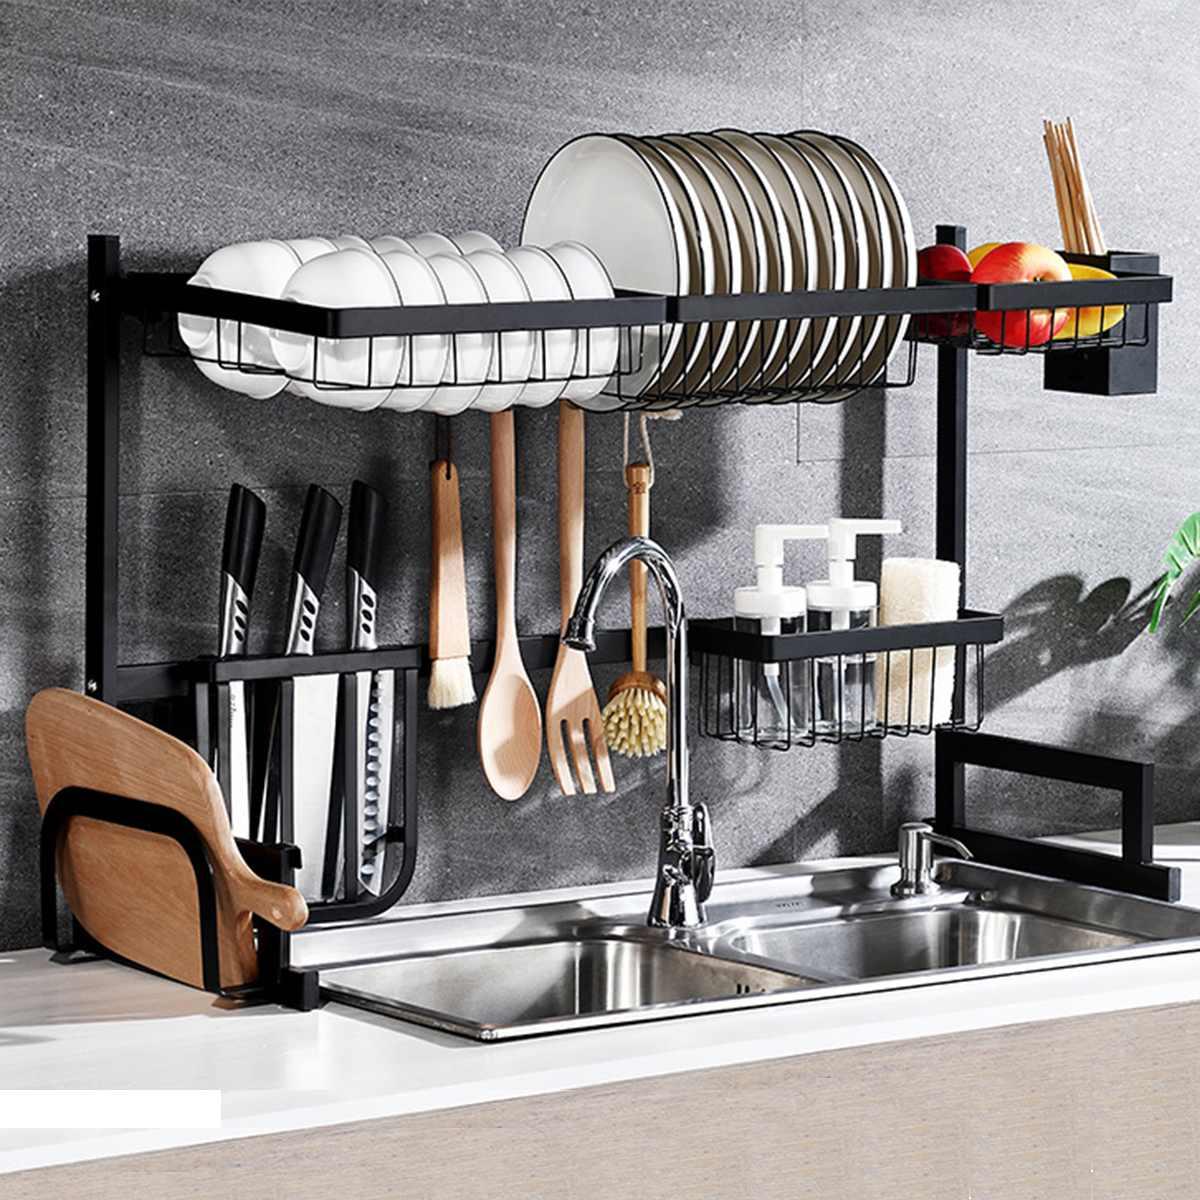 Stainless Steel Storage Holders Racks Kitchen Shelf Rack Wall Drain Dish Rack Pot Lid Spice Holder DIY Kitchen Organizer 65/85cm